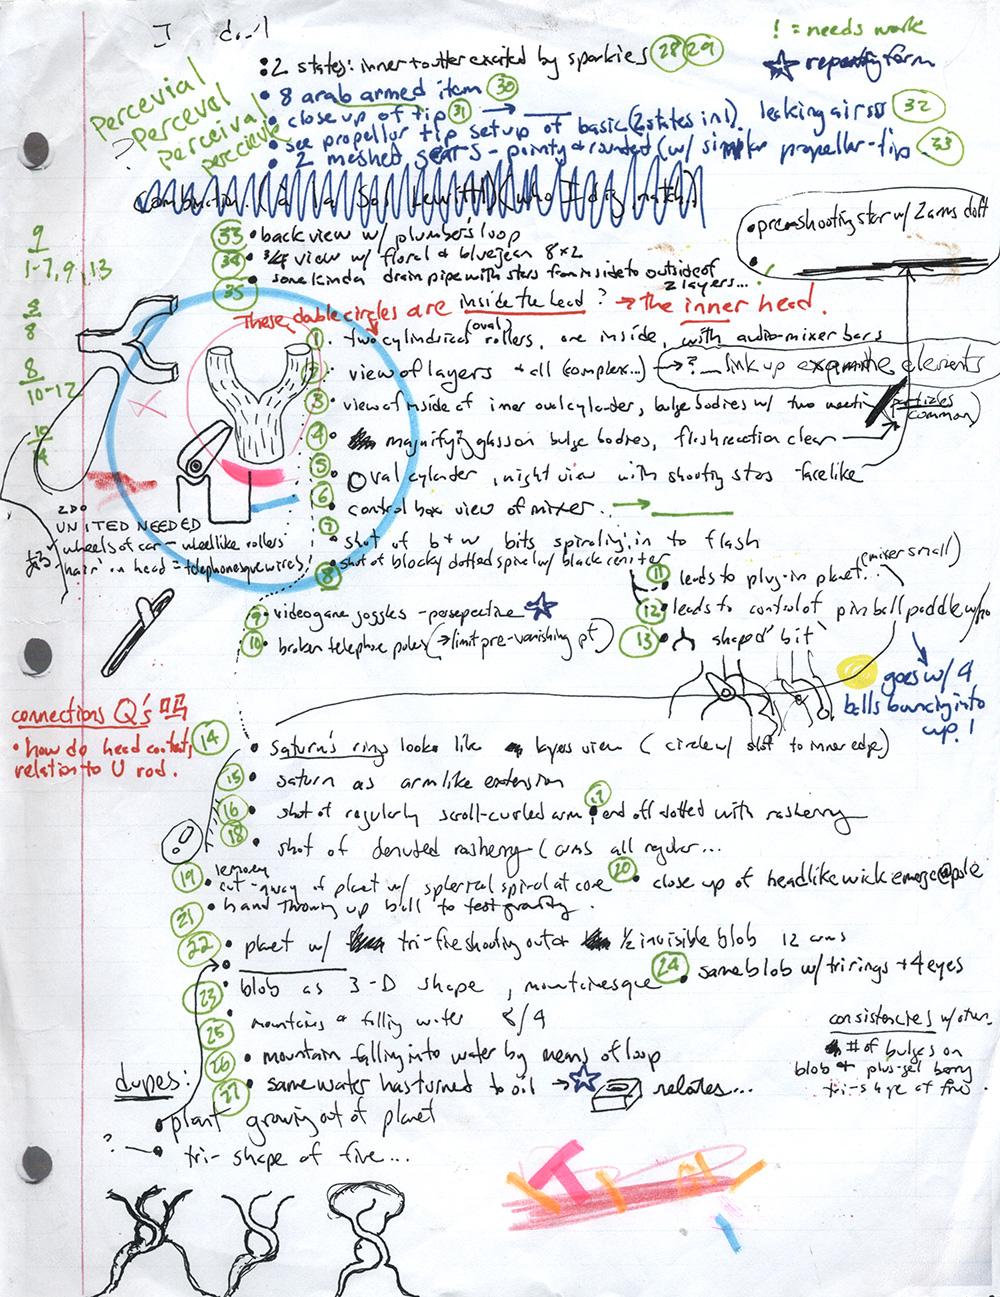 perceival notes.jpg